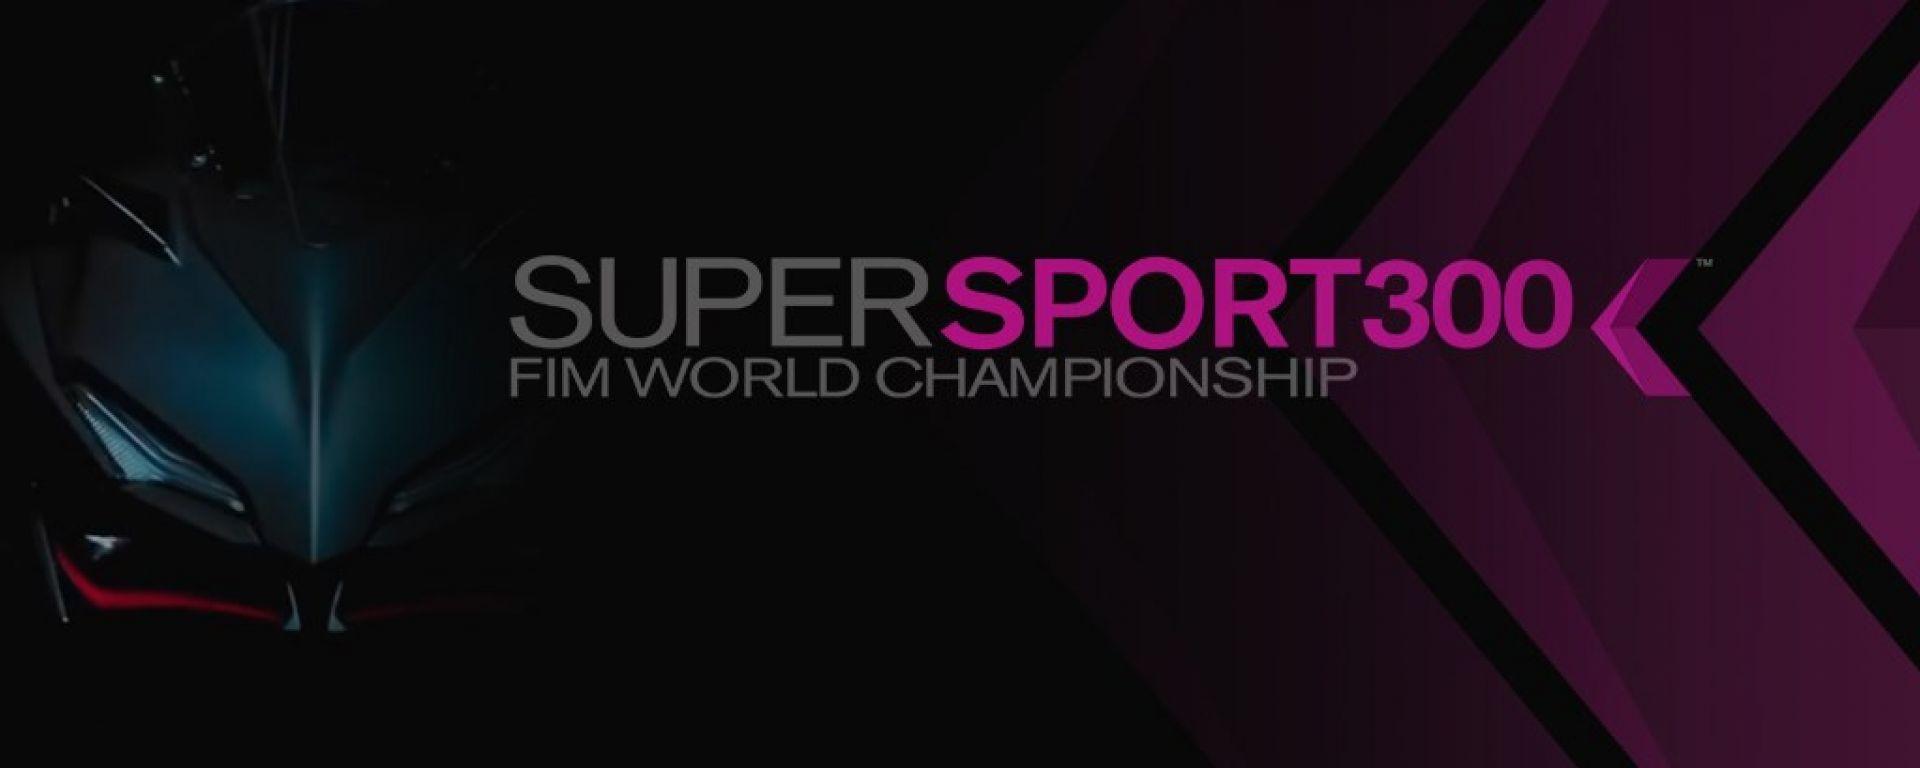 WSBK 2017: arriva la classe Supersport 300